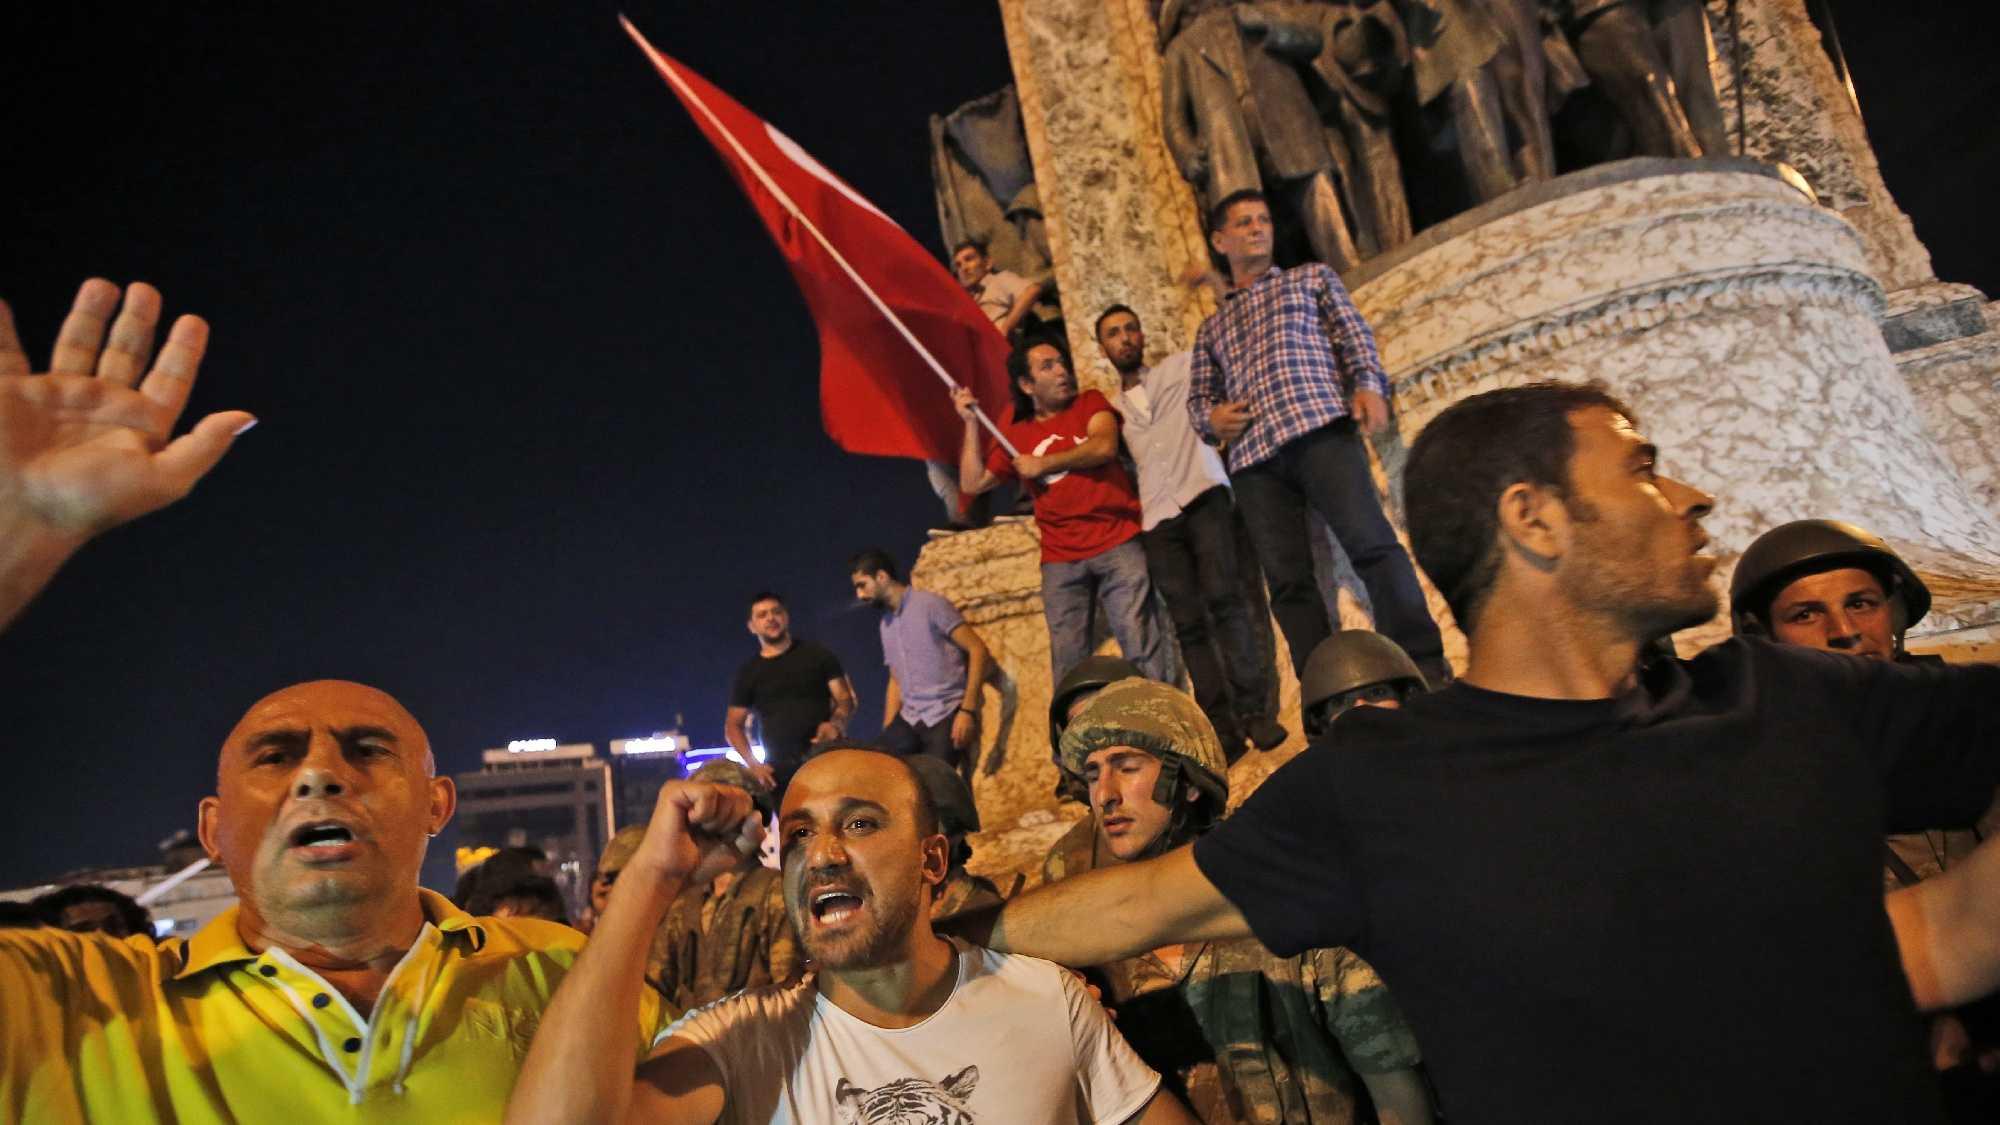 KSBW Turkey unrest.jpg